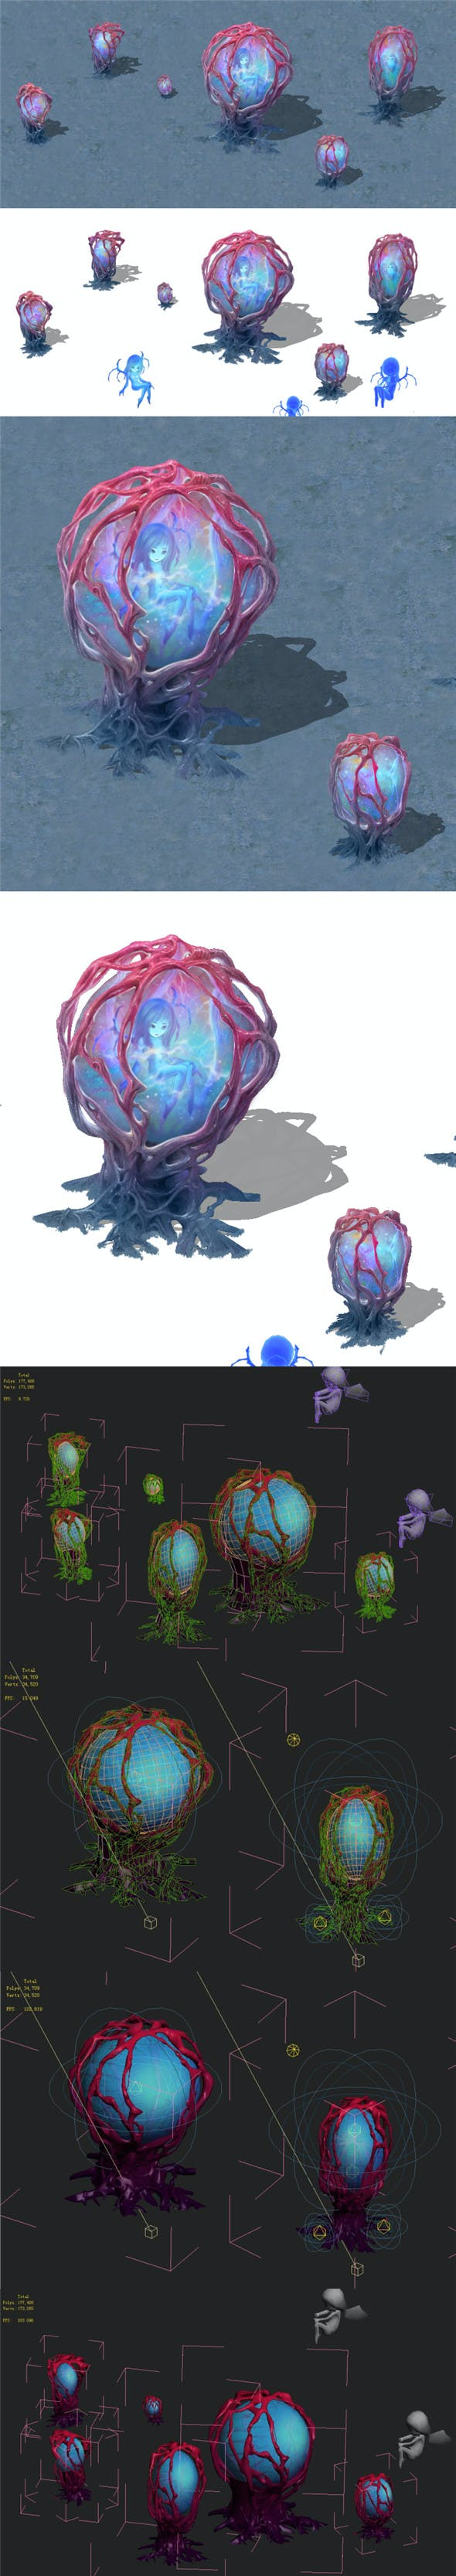 Cartoon version - banshee fetus demon tree 01 - 3DOcean Item for Sale